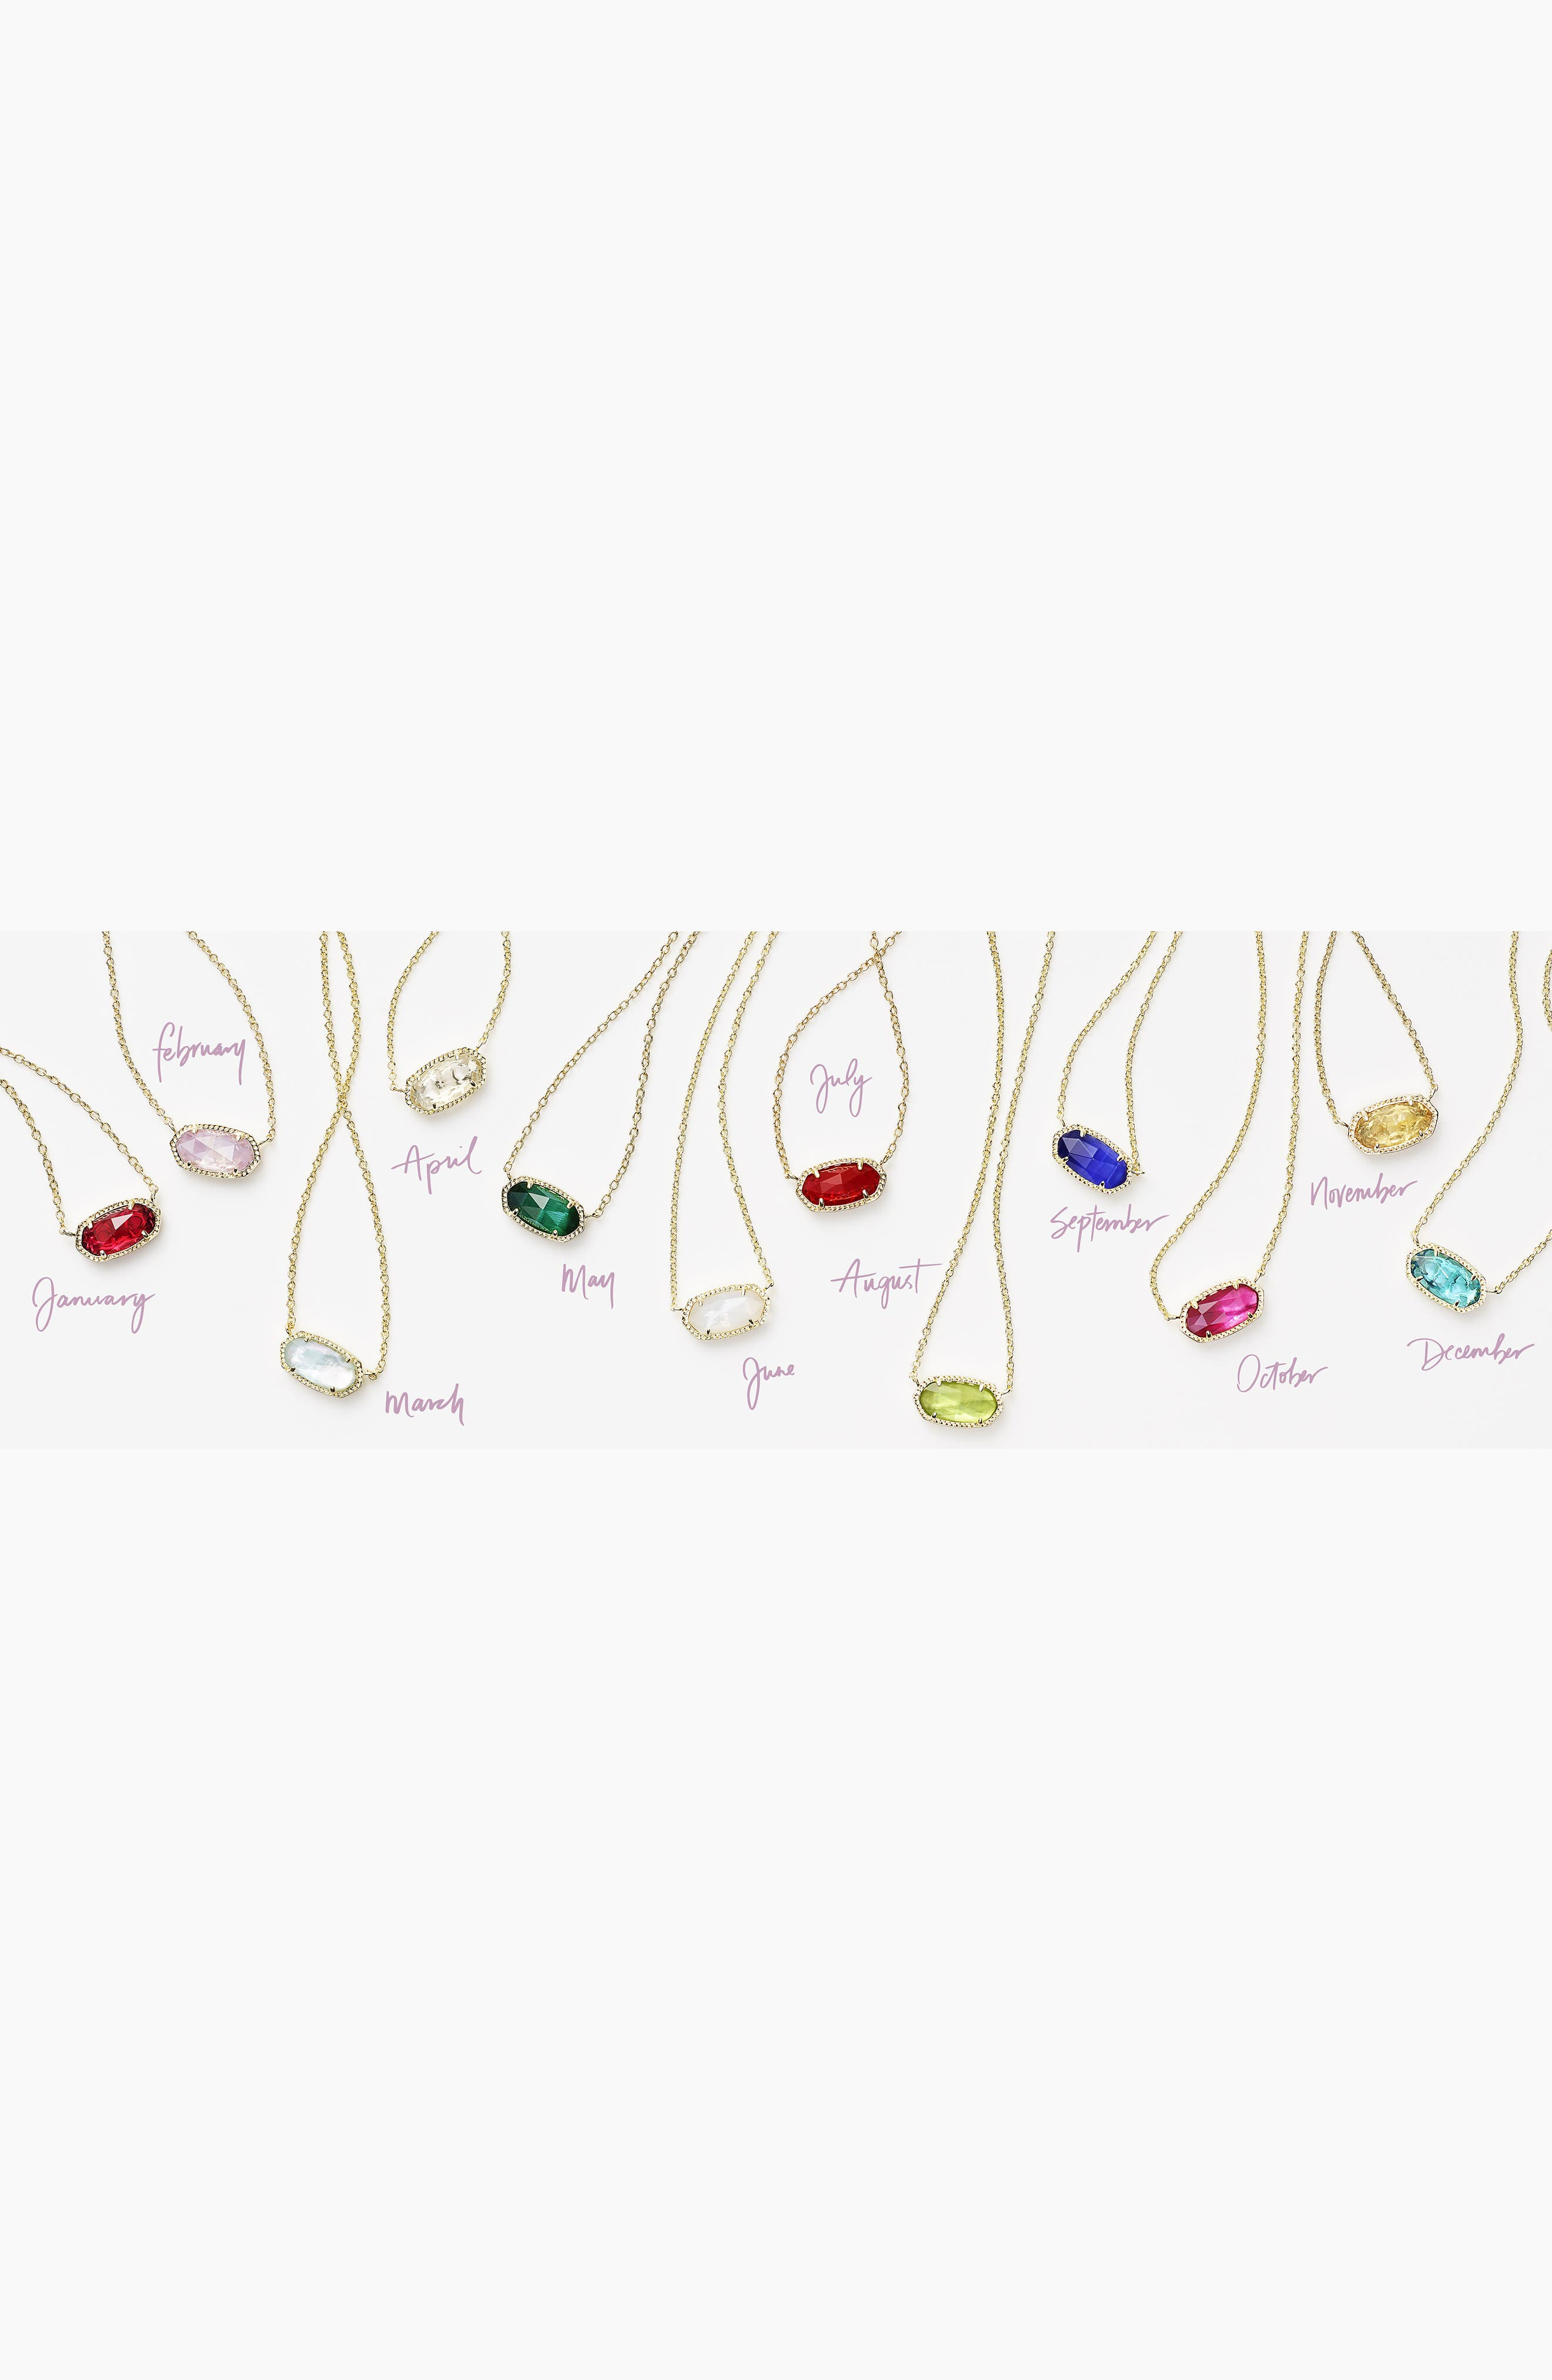 KENDRA SCOTT, Elisa Birthstone Pendant Necklace, Alternate thumbnail 3, color, JANUARY/BERRY/GOLD